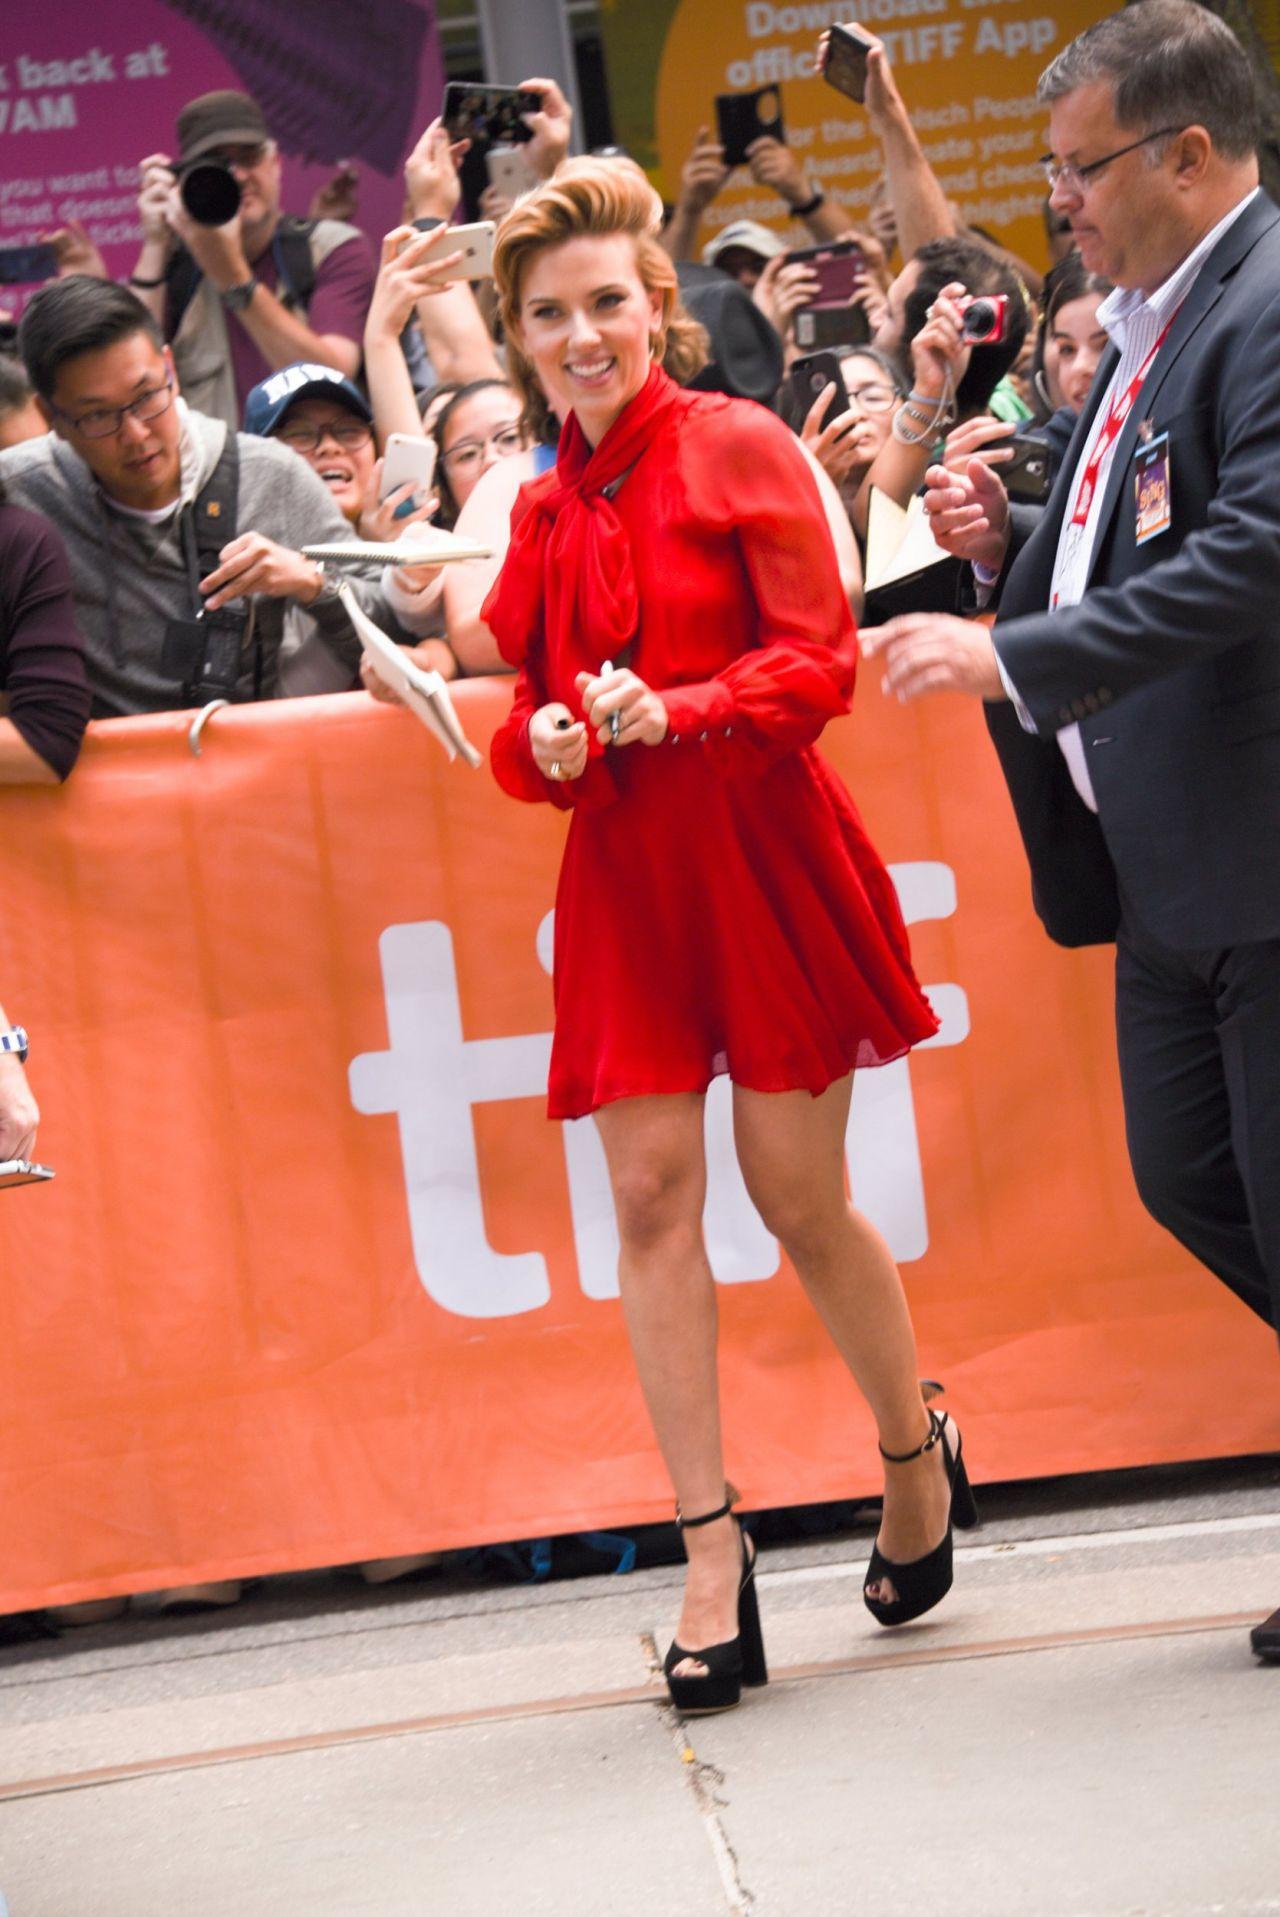 Scarlett Johansson Sing Premiere At Toronto International Film Festival 9 11 2016